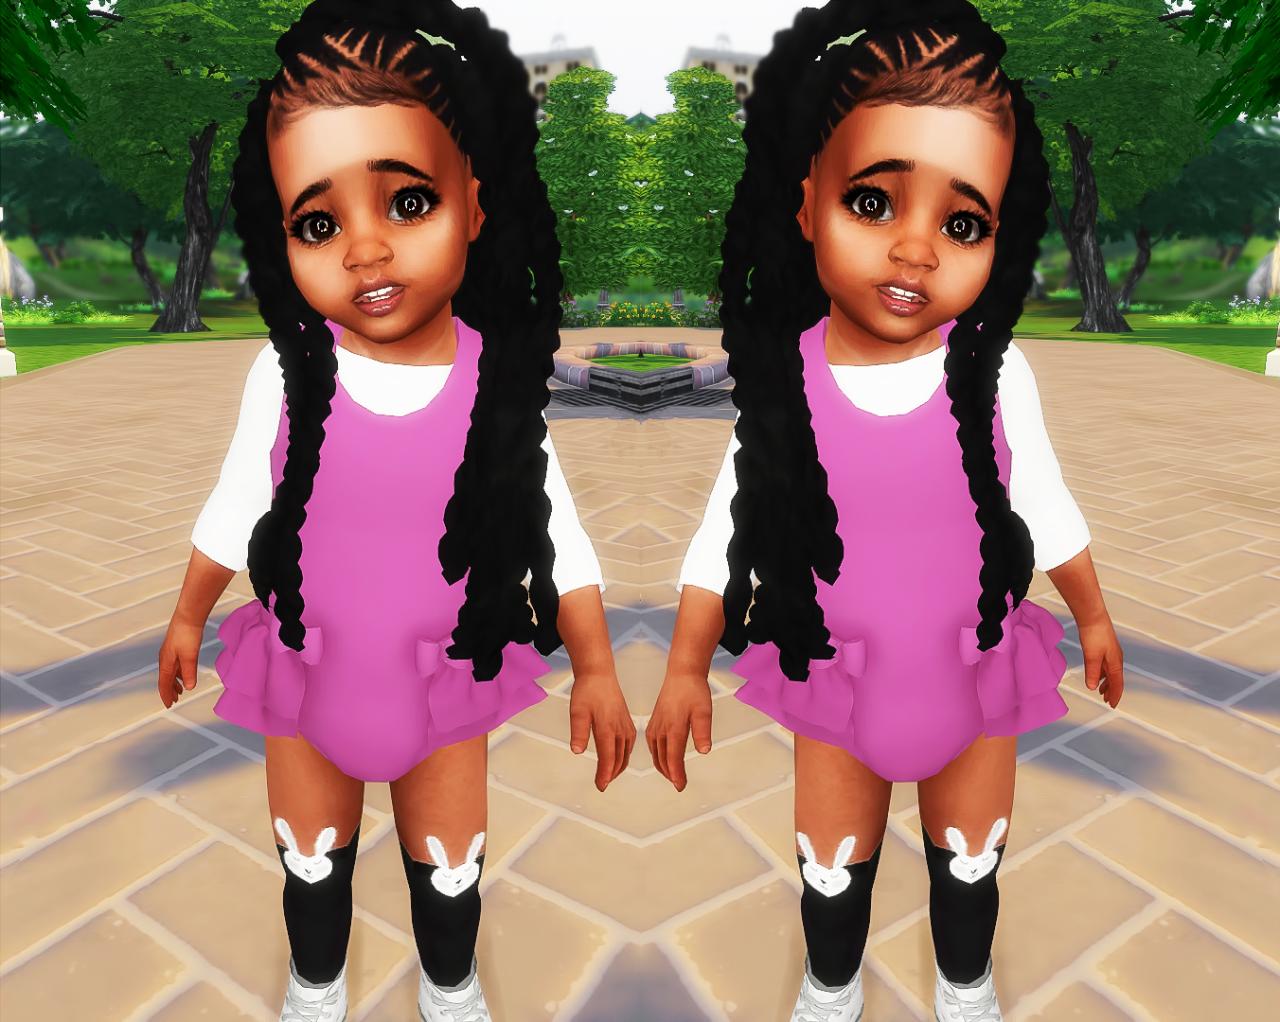 Ebonixsims Ebonix Broodsims Jumbo Braids Sims 4 Black Hair Toddler Hair Sims 4 Sims 4 Toddler